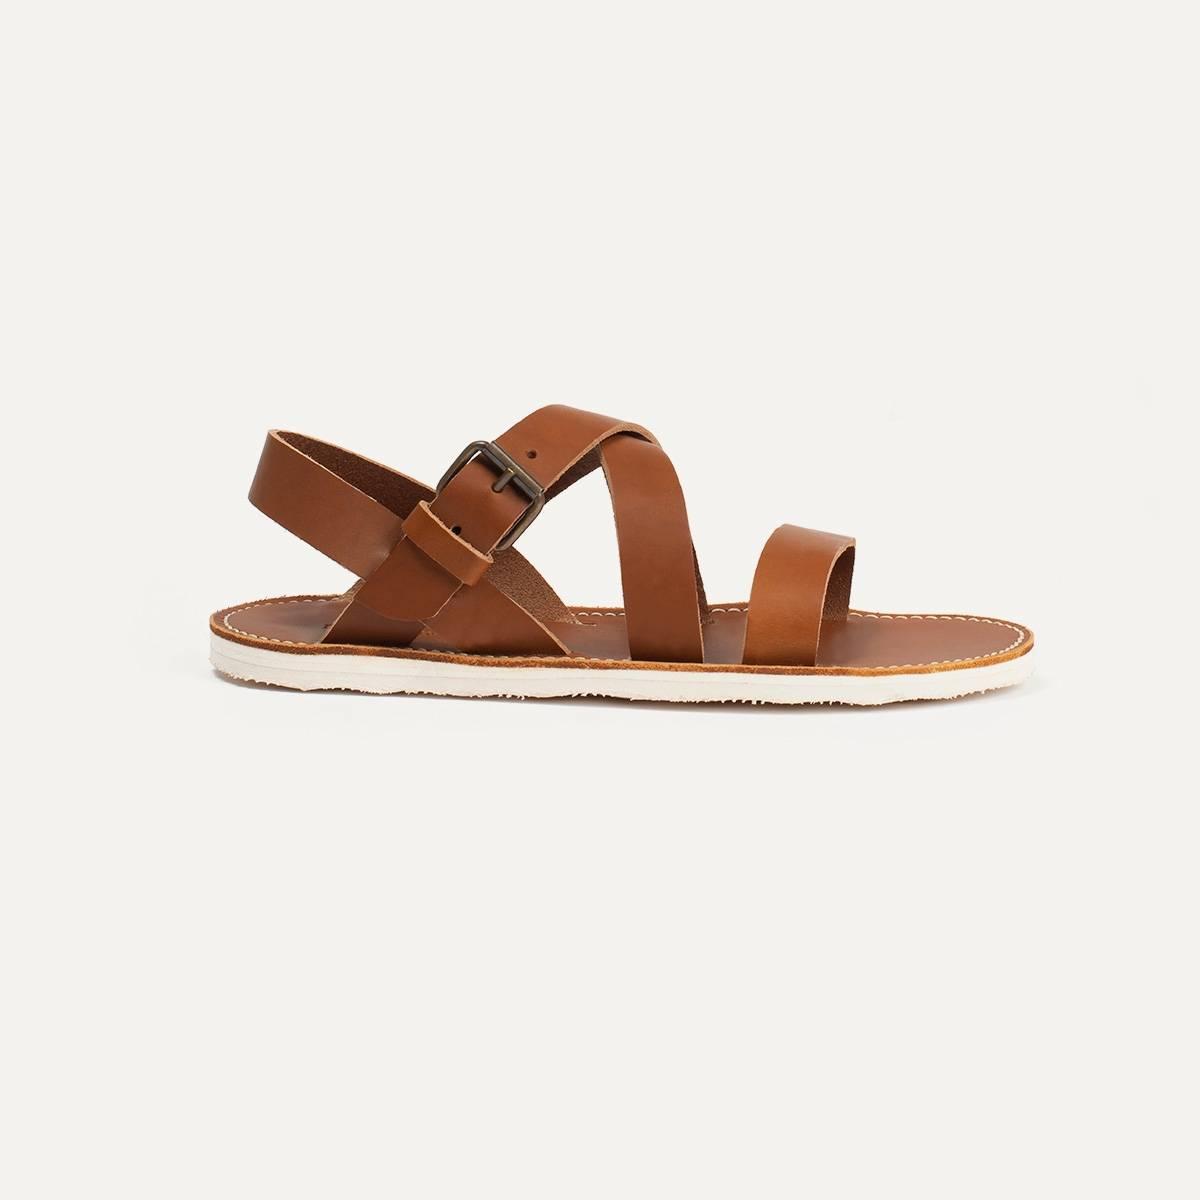 Iwate leather sandals - Pain Brûlé (image n°1)